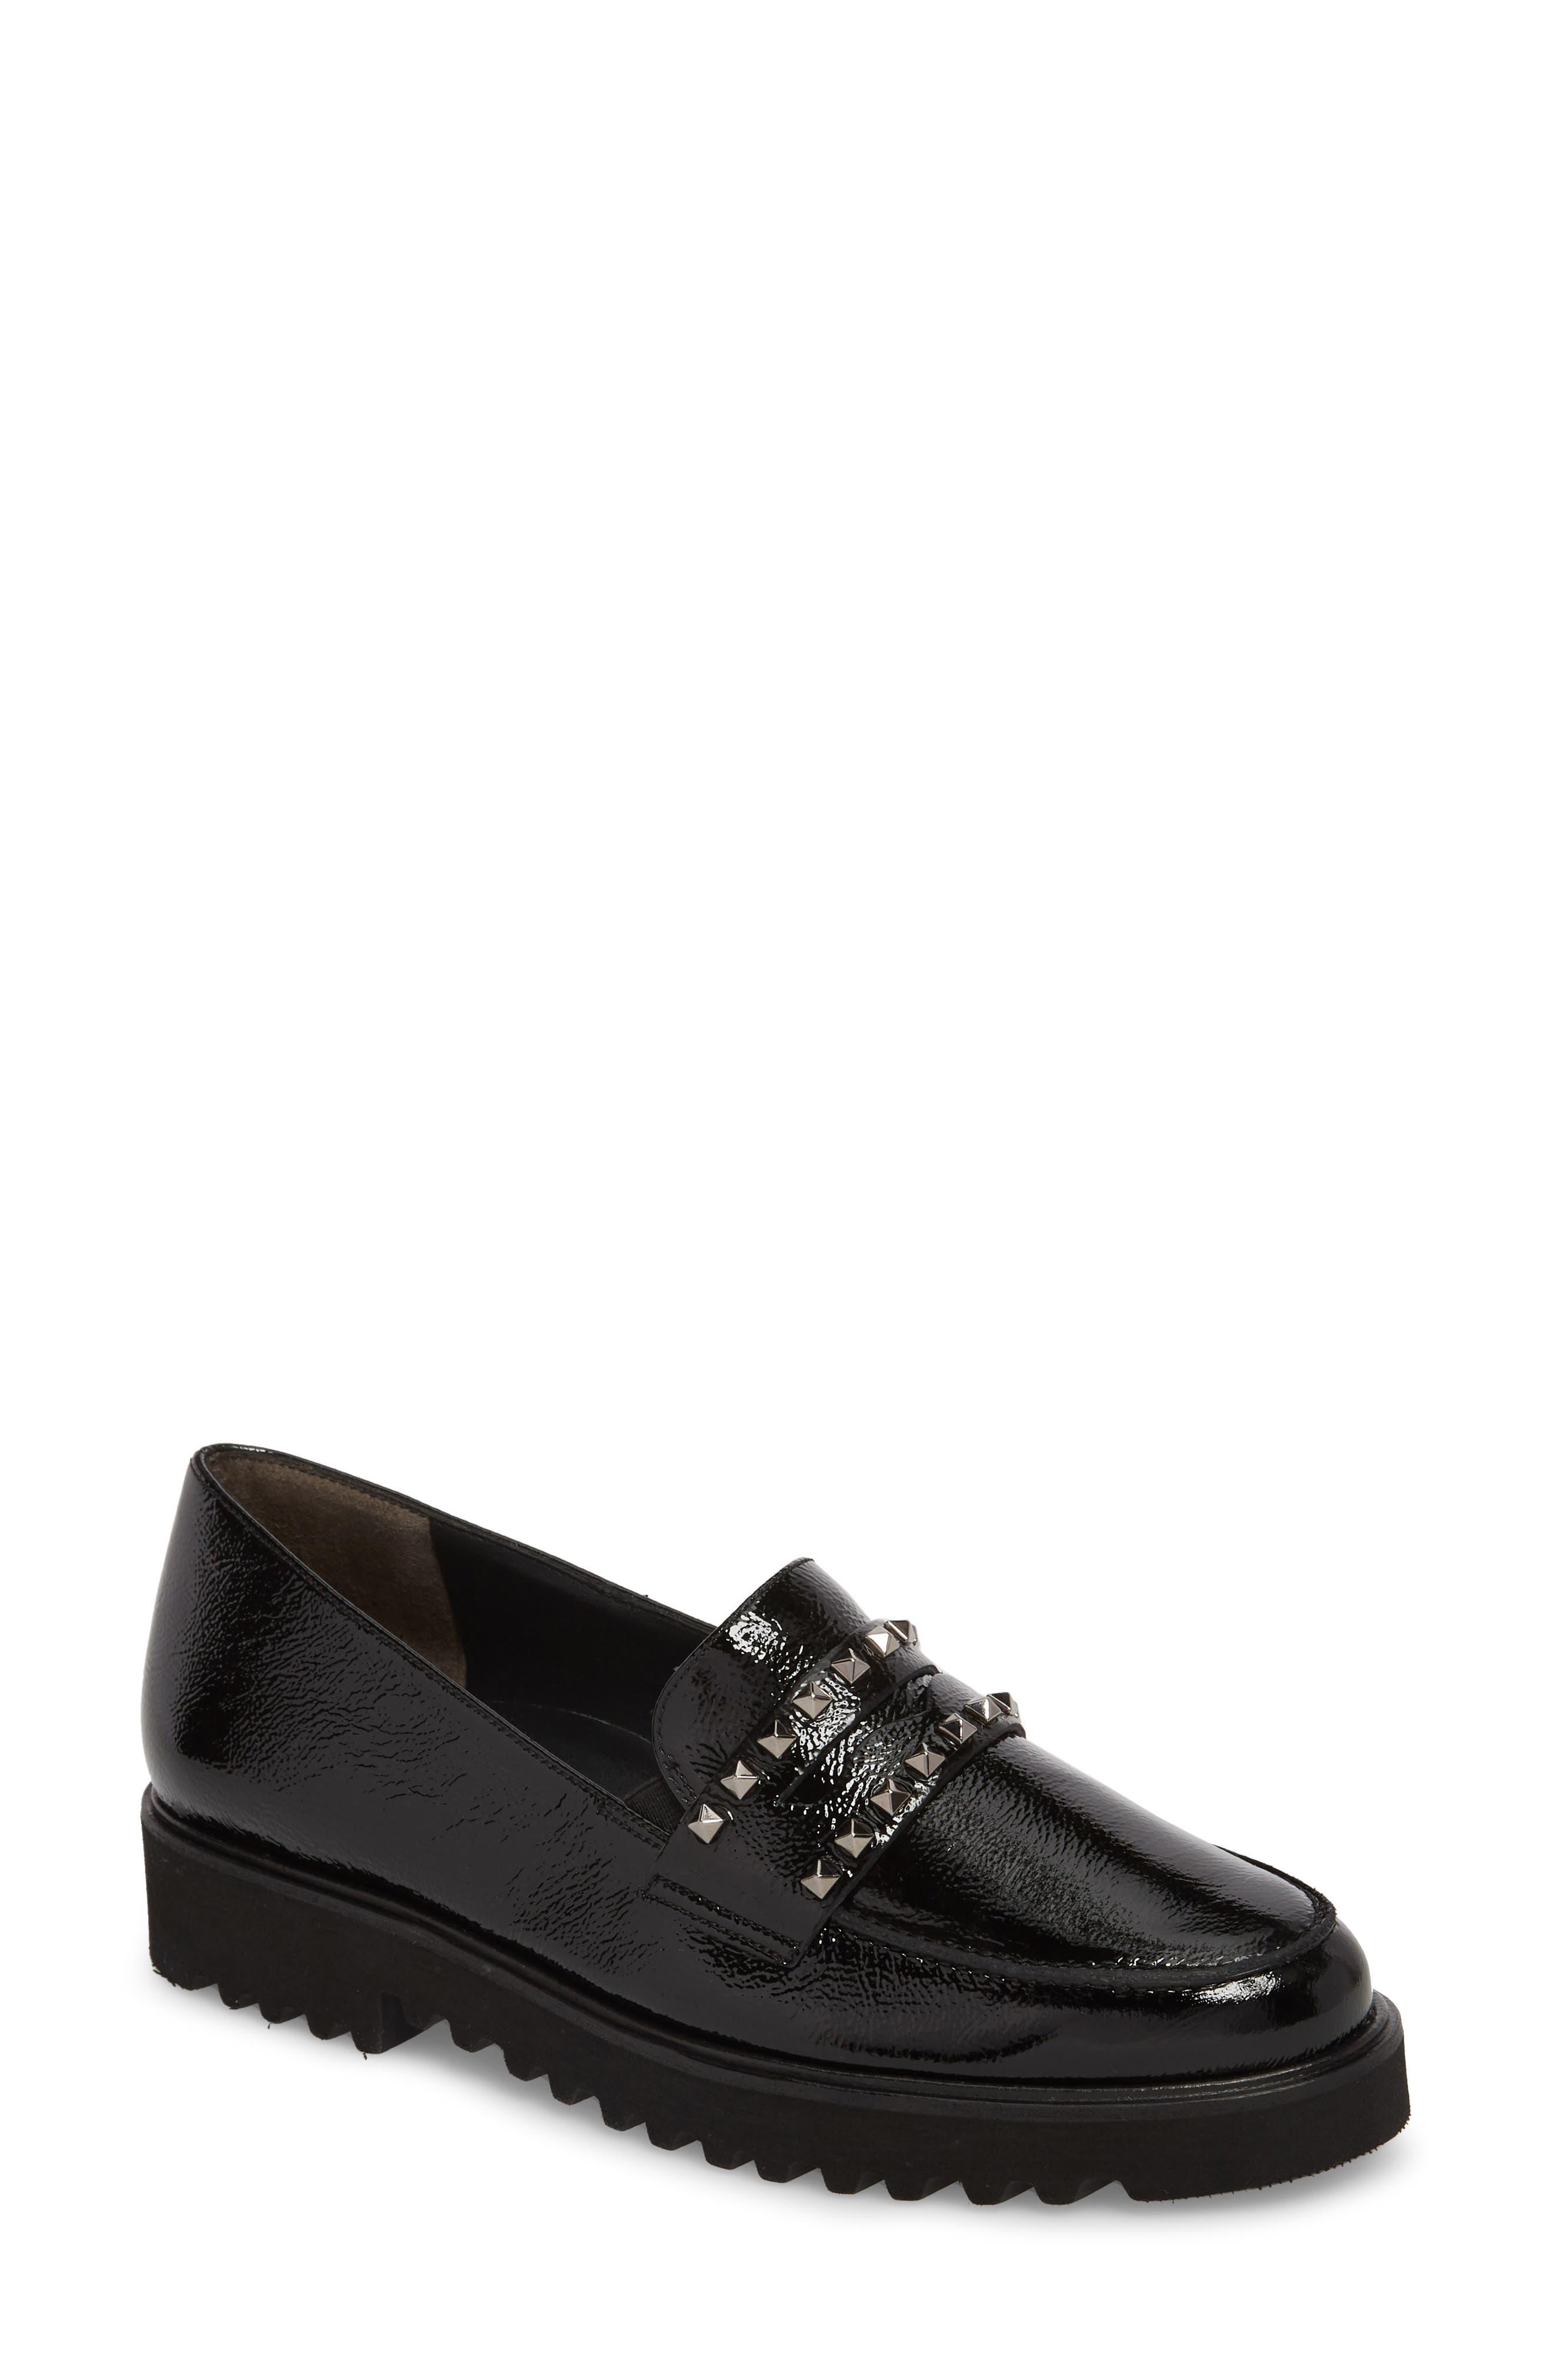 Sofia Loafer,                         Main,                         color, Black Crinkle Patent